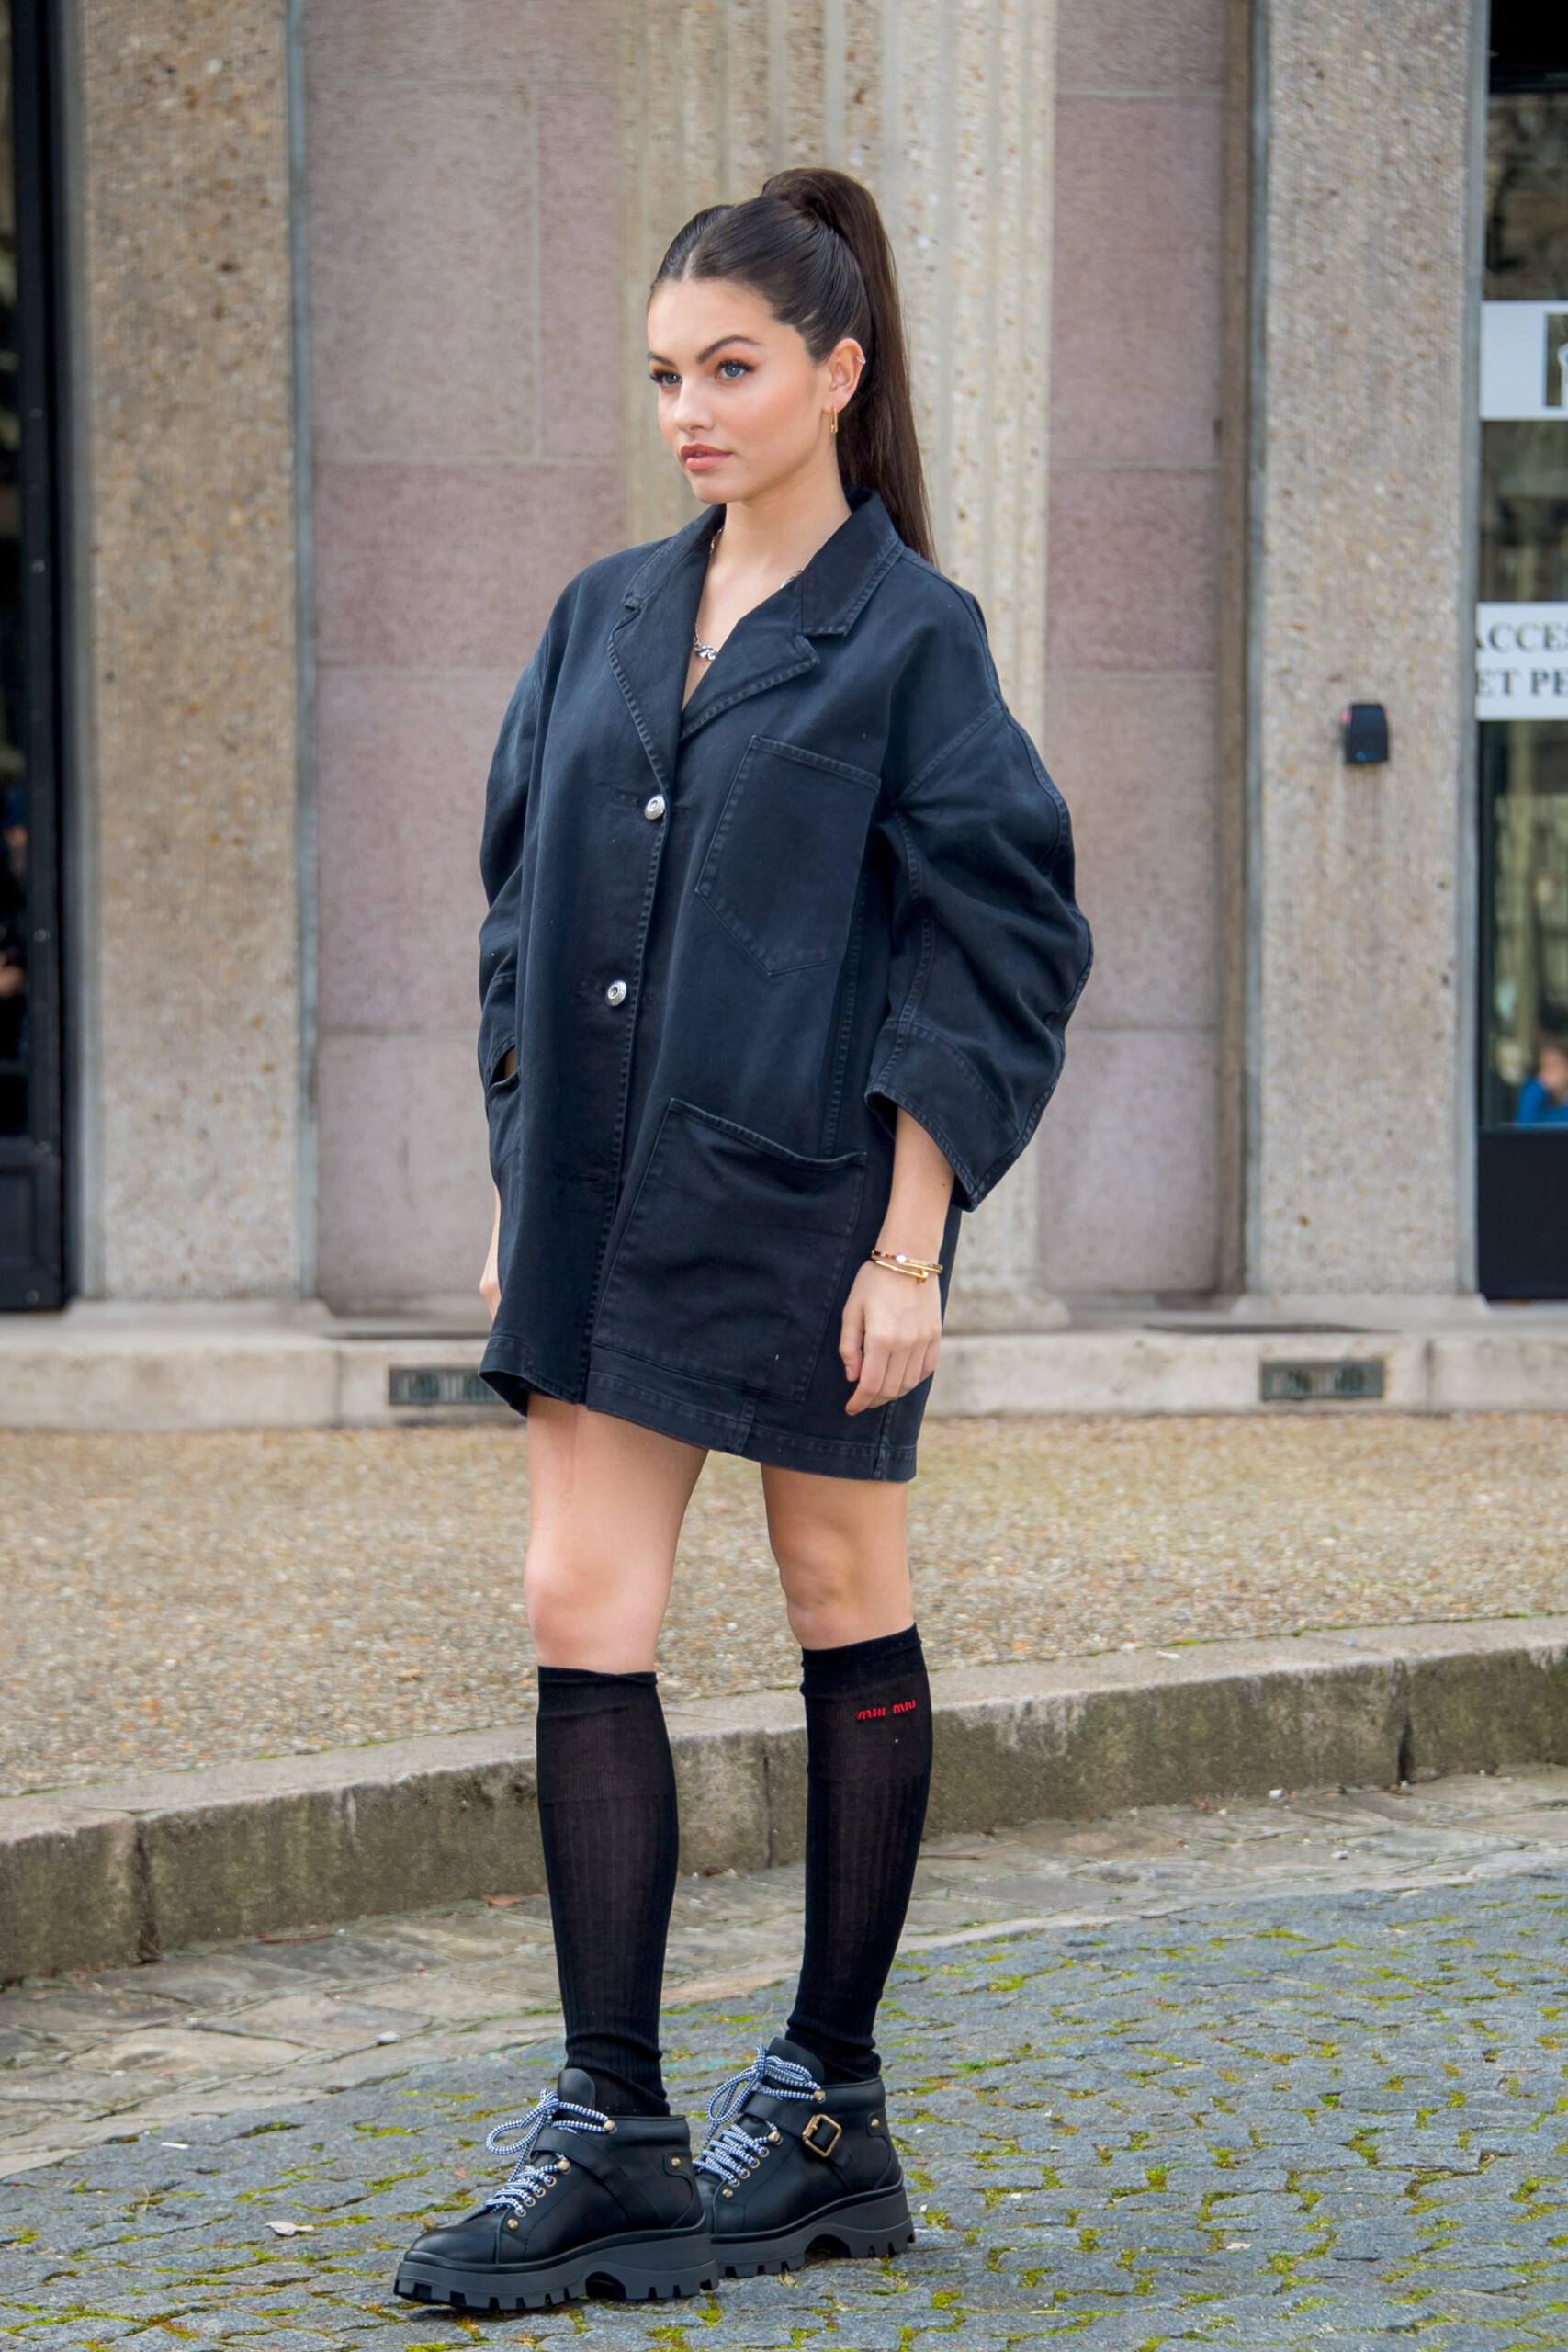 Thylane Blondeau Beautiful